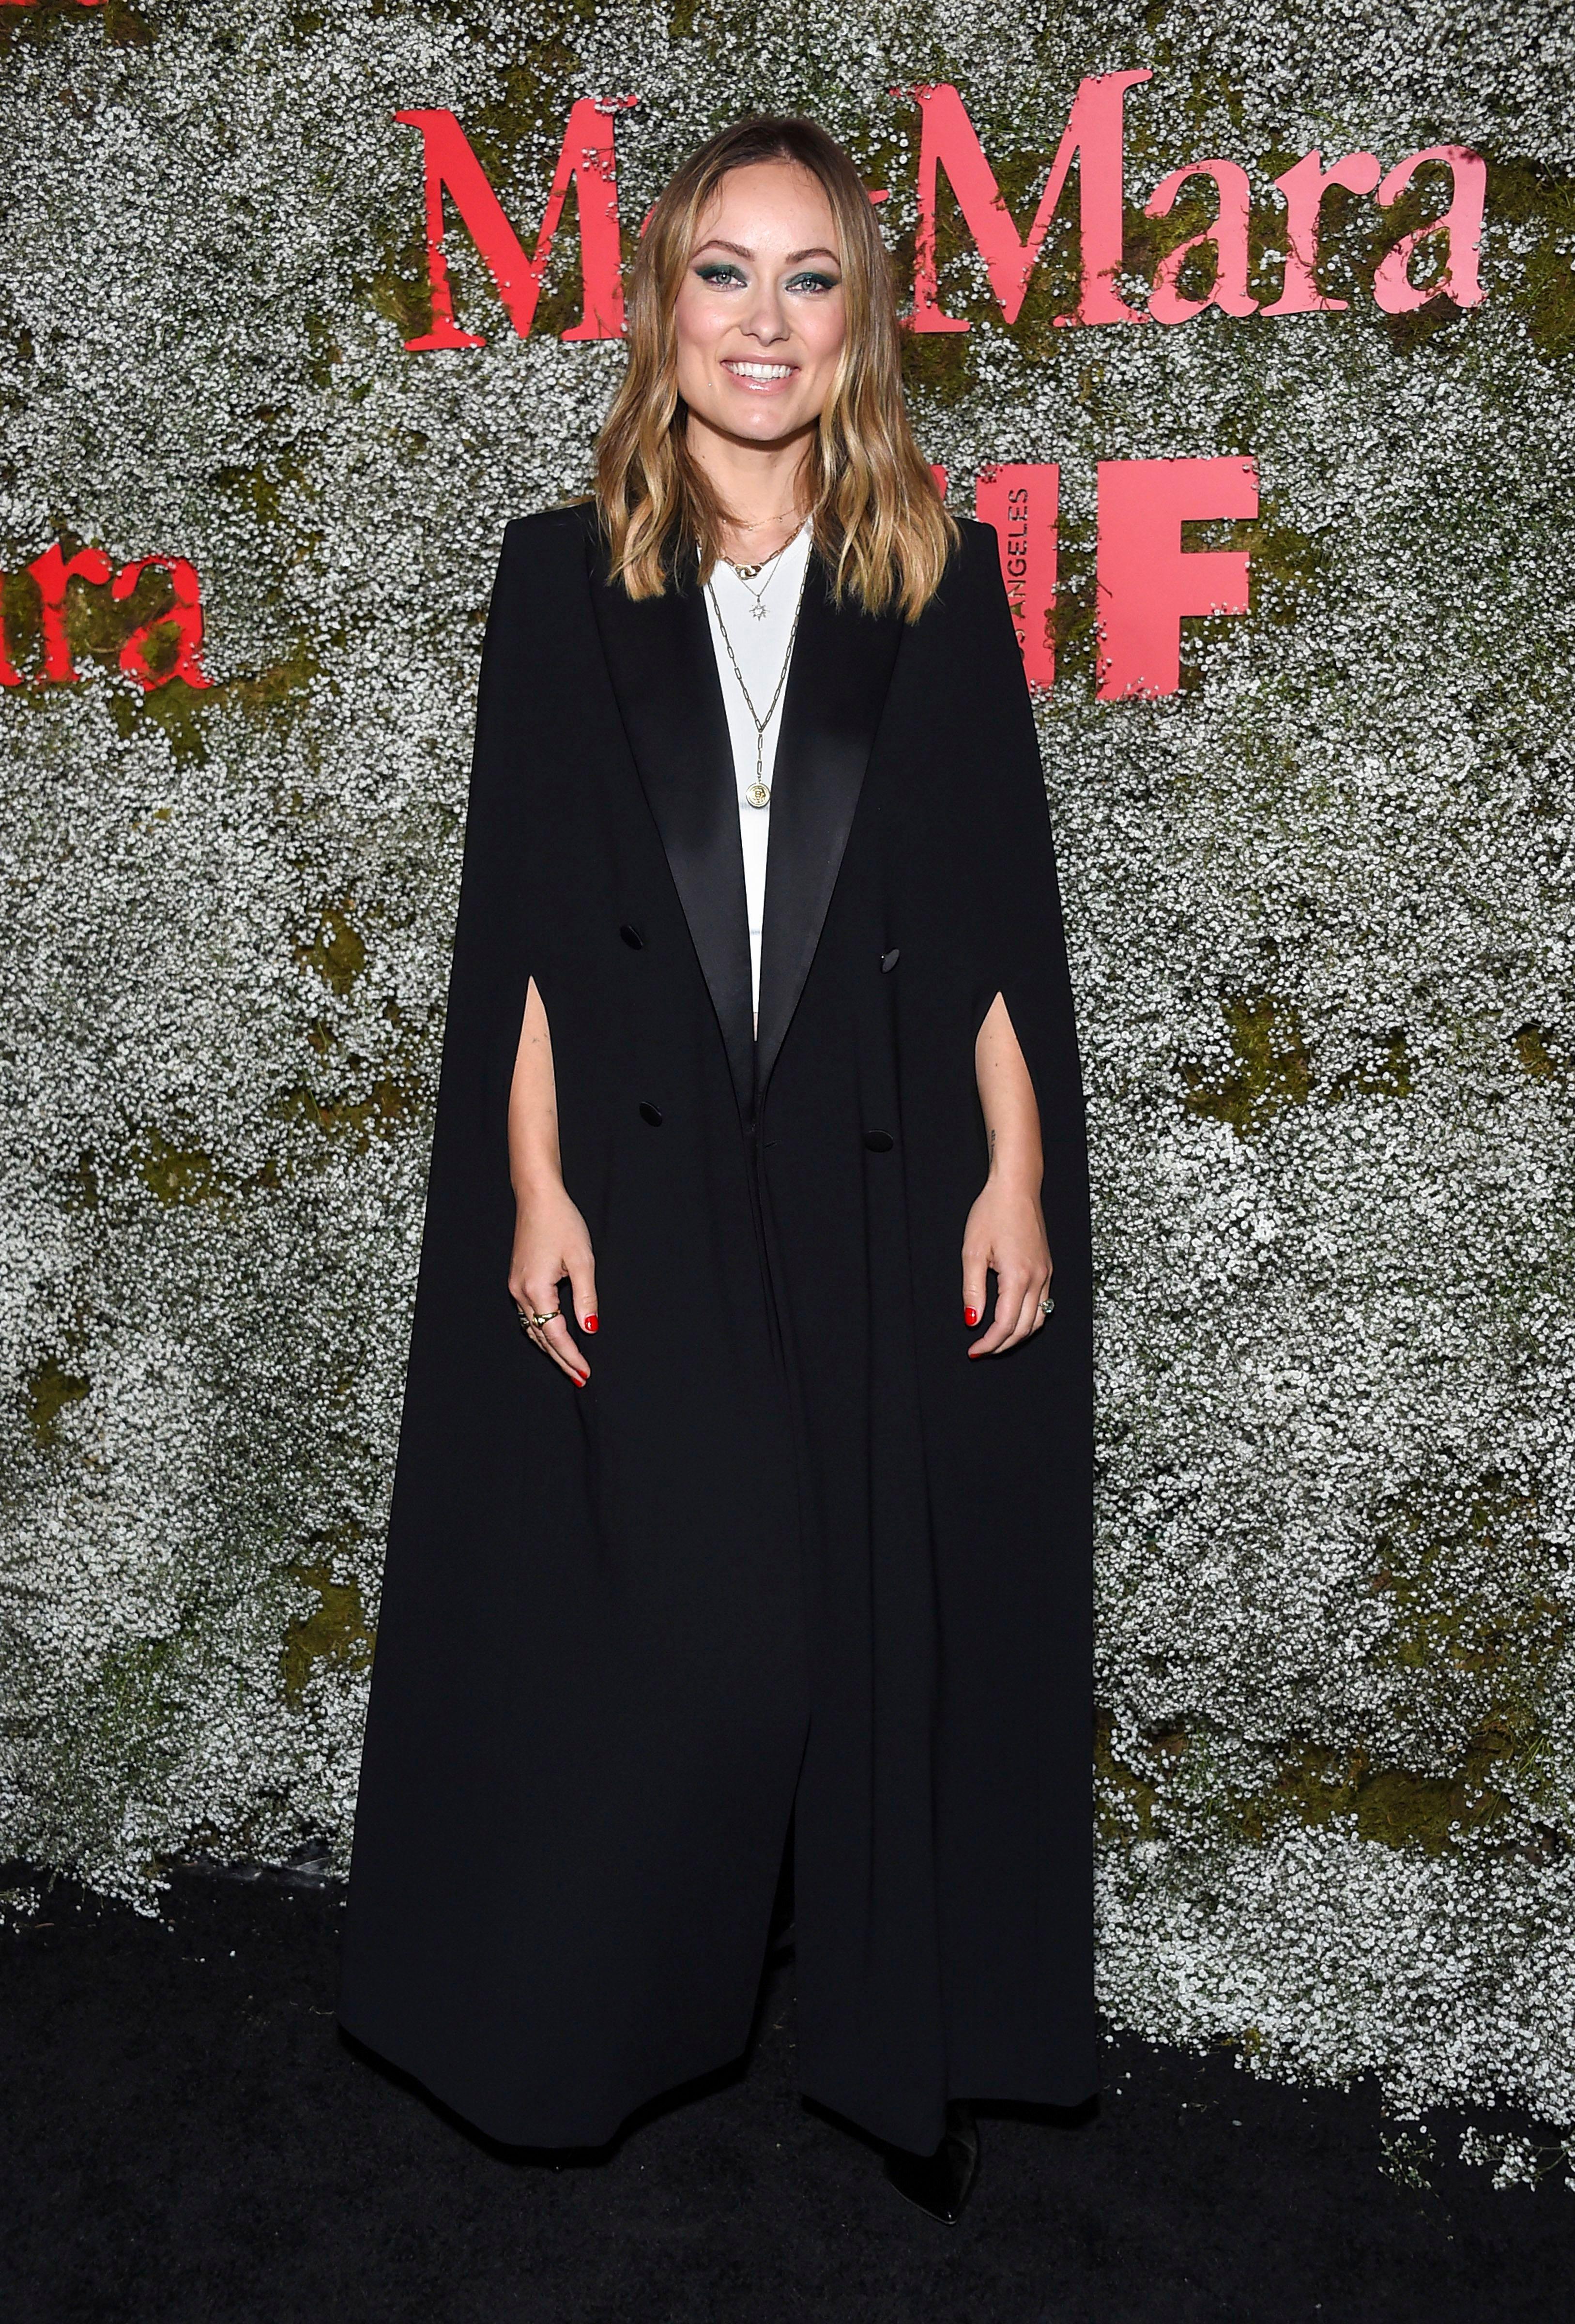 Olivia WildeMaxMara Women in Film Event, Arrivals, Chateau Marmont, Los Angeles, USA - 11 Jun 2019 Wearing Max Mara